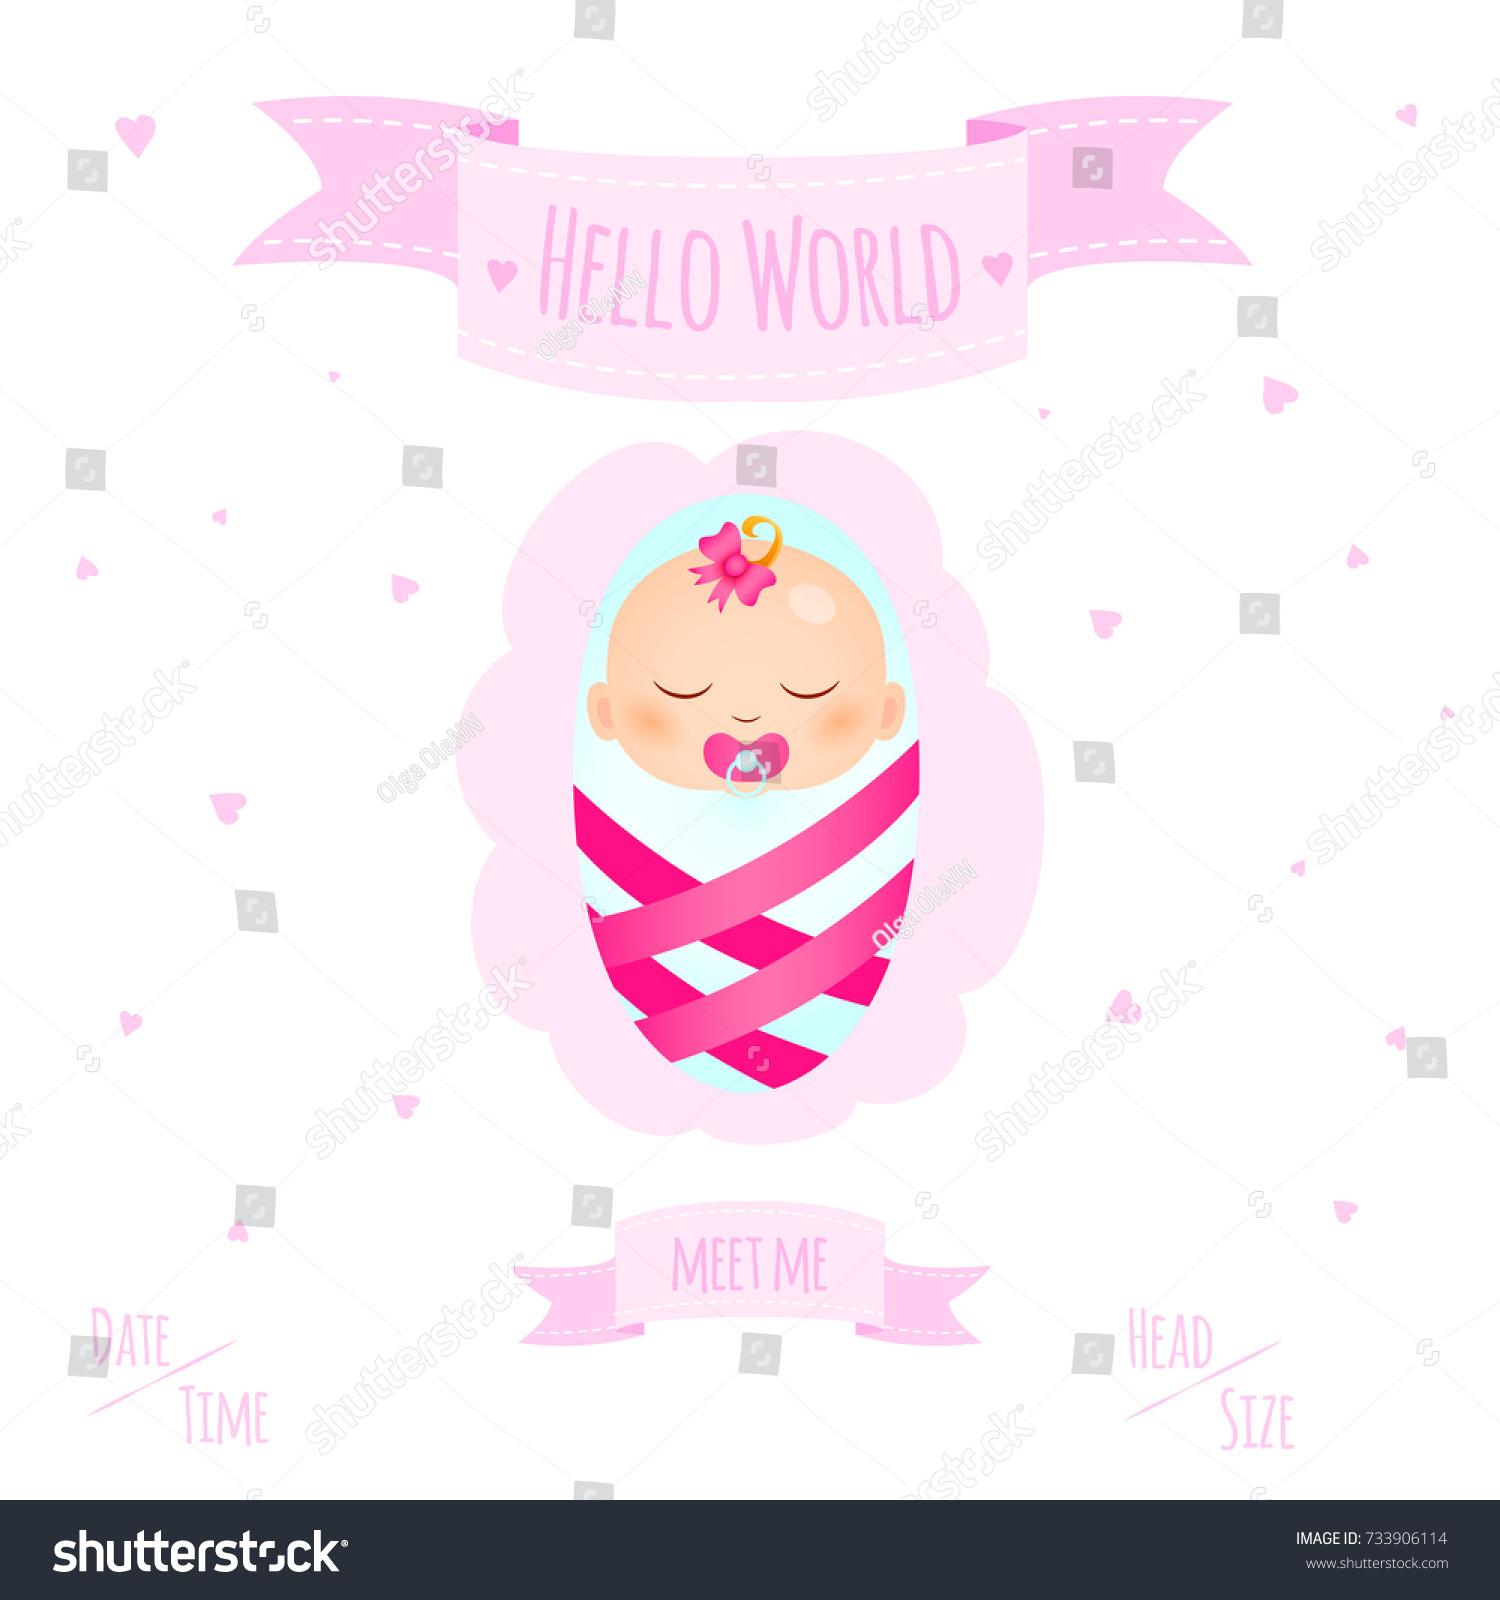 New Child Born Baby Newborn Greeting Stock Vector Royalty Free